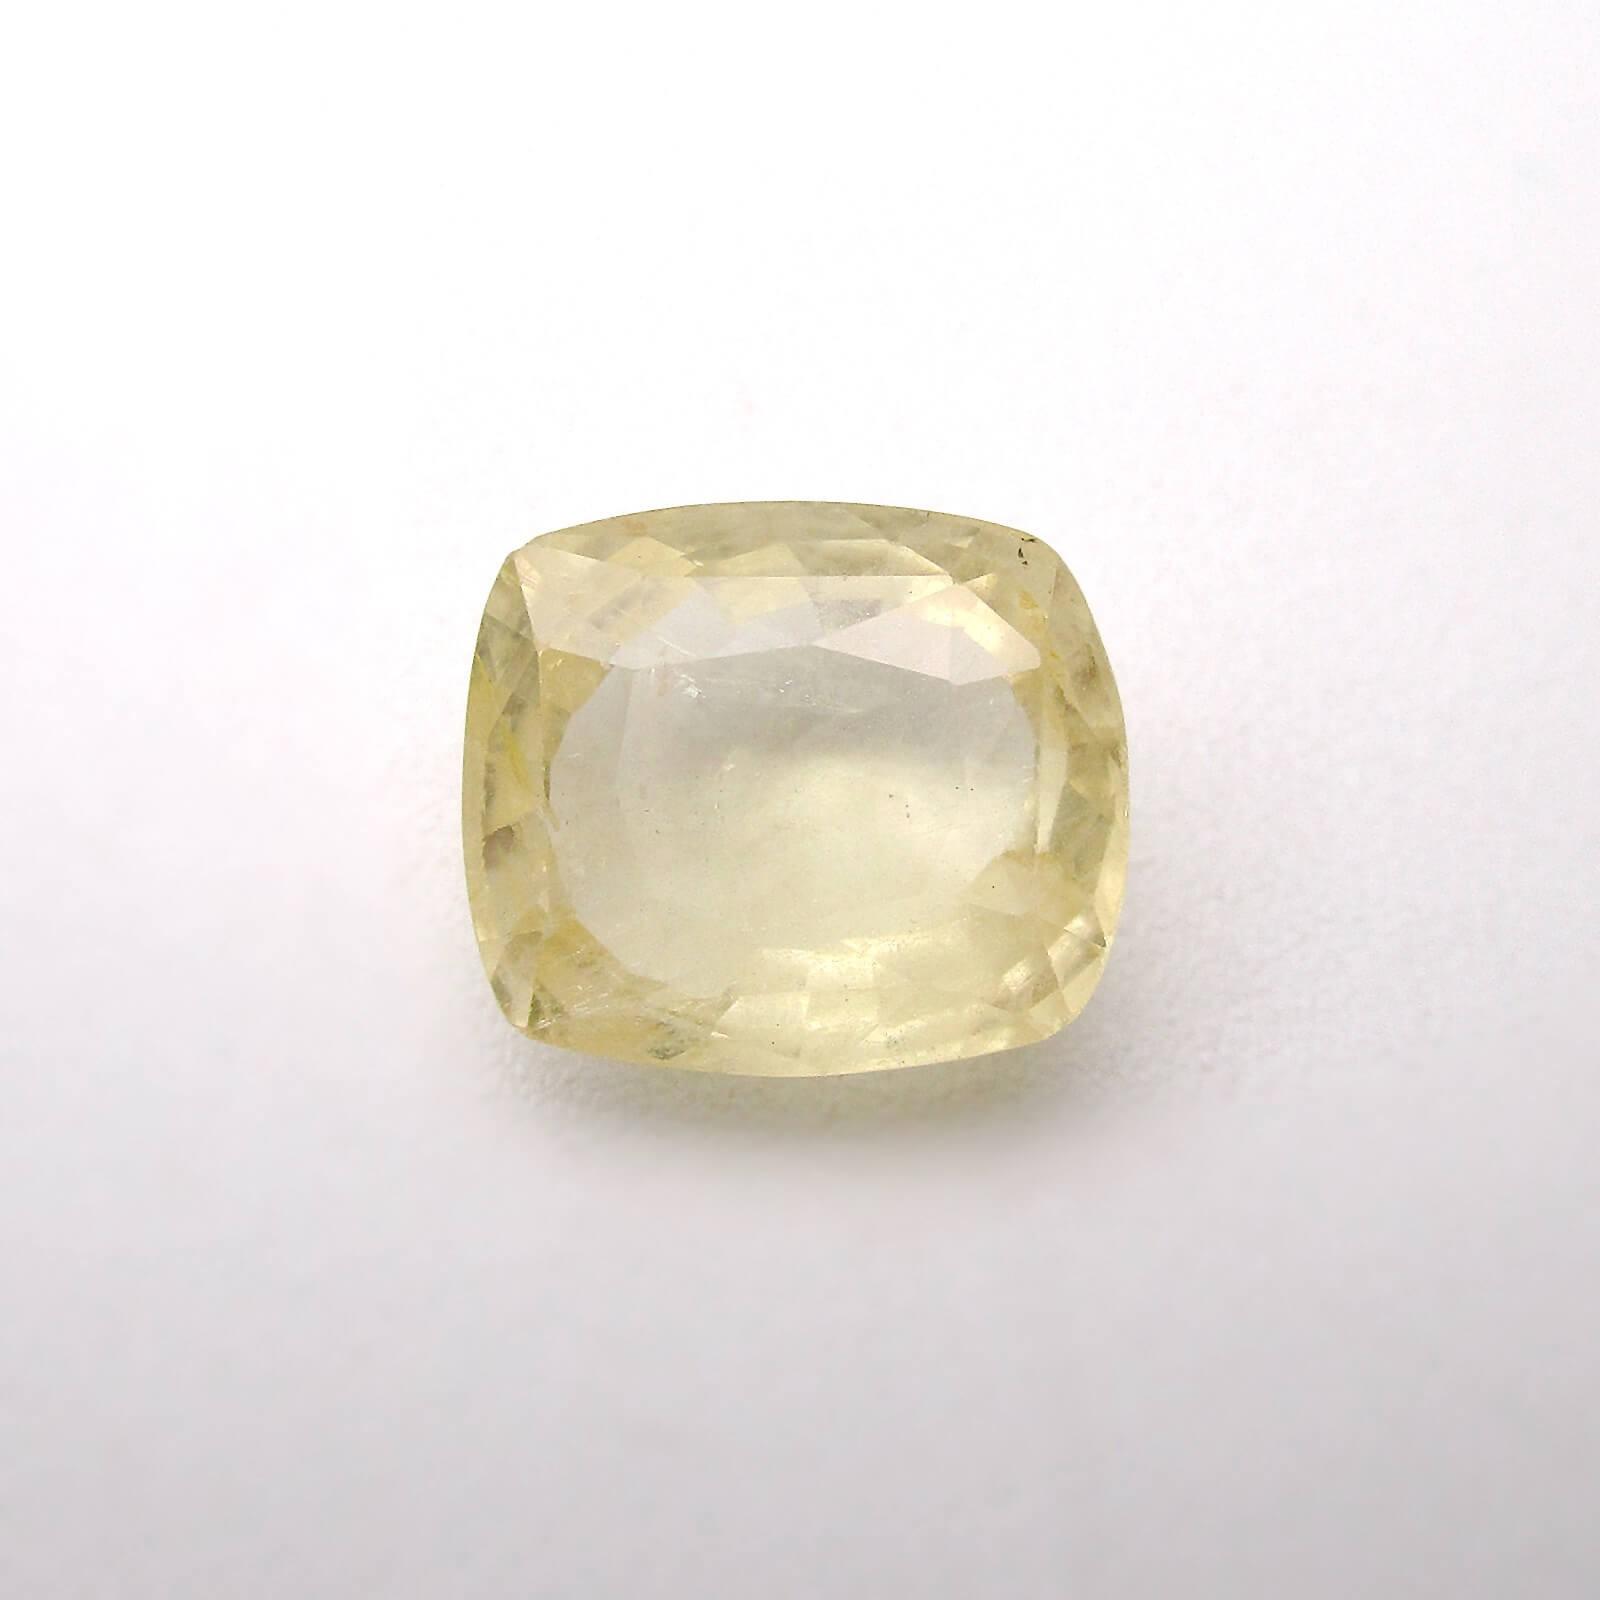 5.68 Carat/ 6.30 Ratti Natural Ceylon Yellow Sapphire (Pukhraj) Gemstone